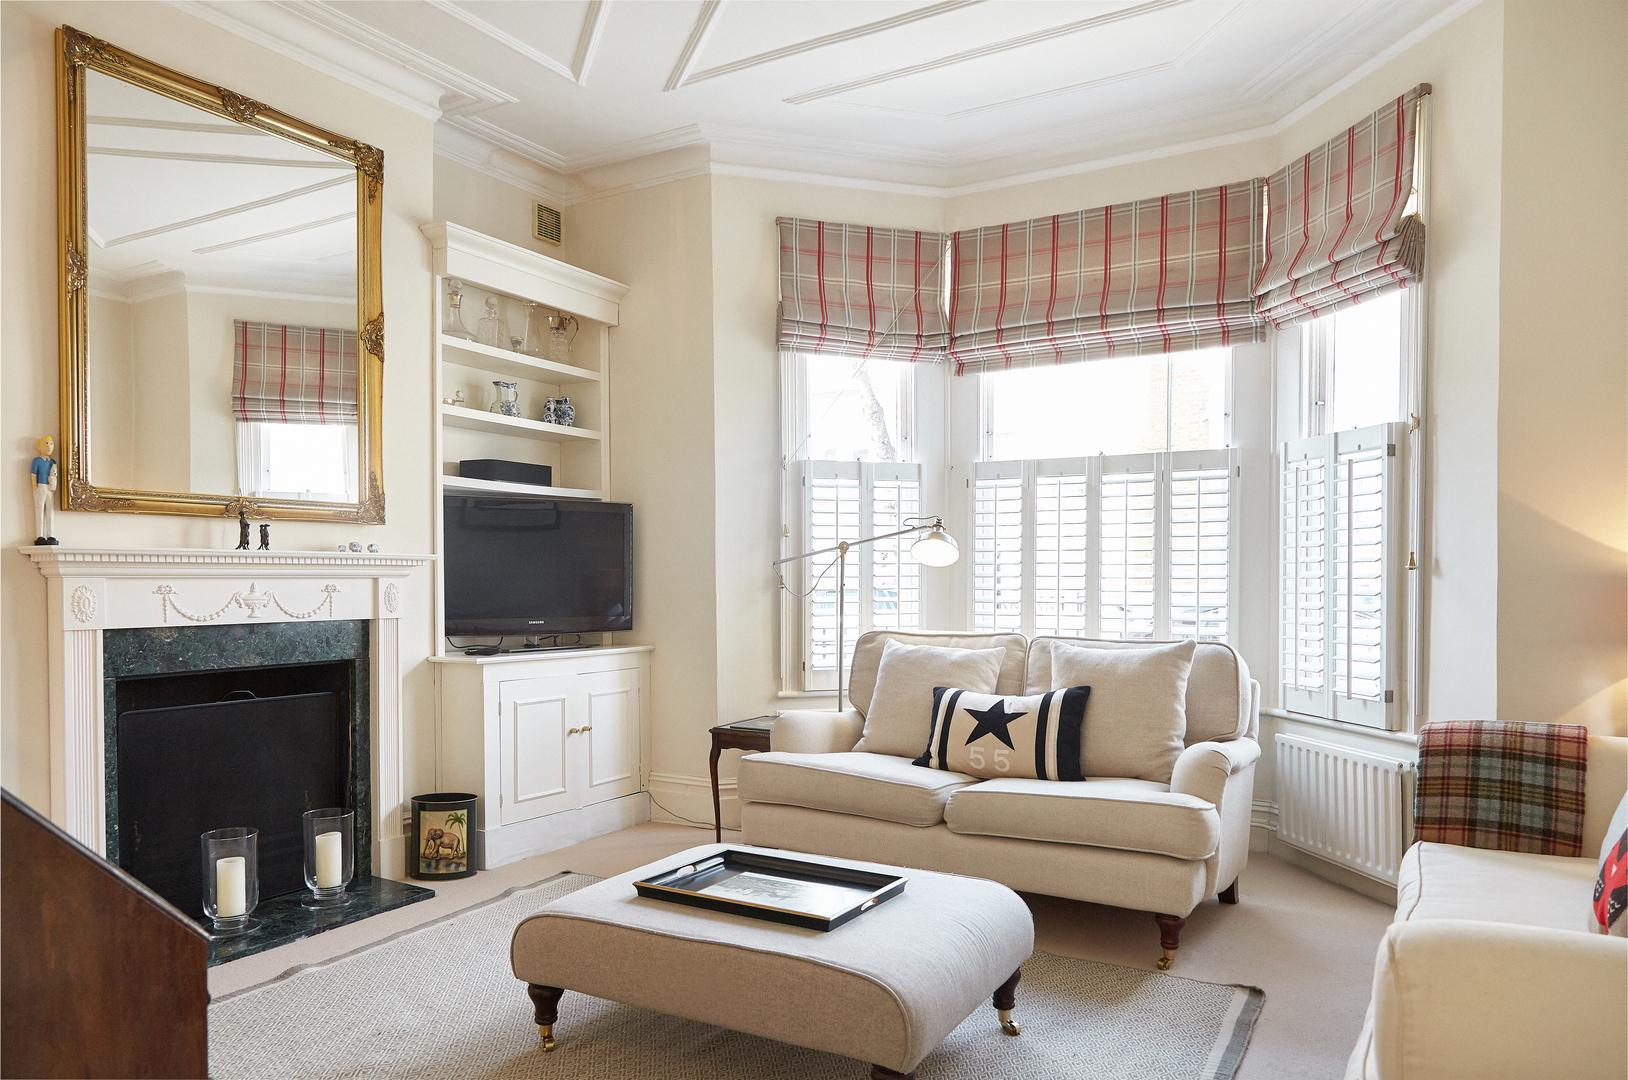 wandsworth elegance 3 bed house in wandsworth u2022 veeve rh veeve com